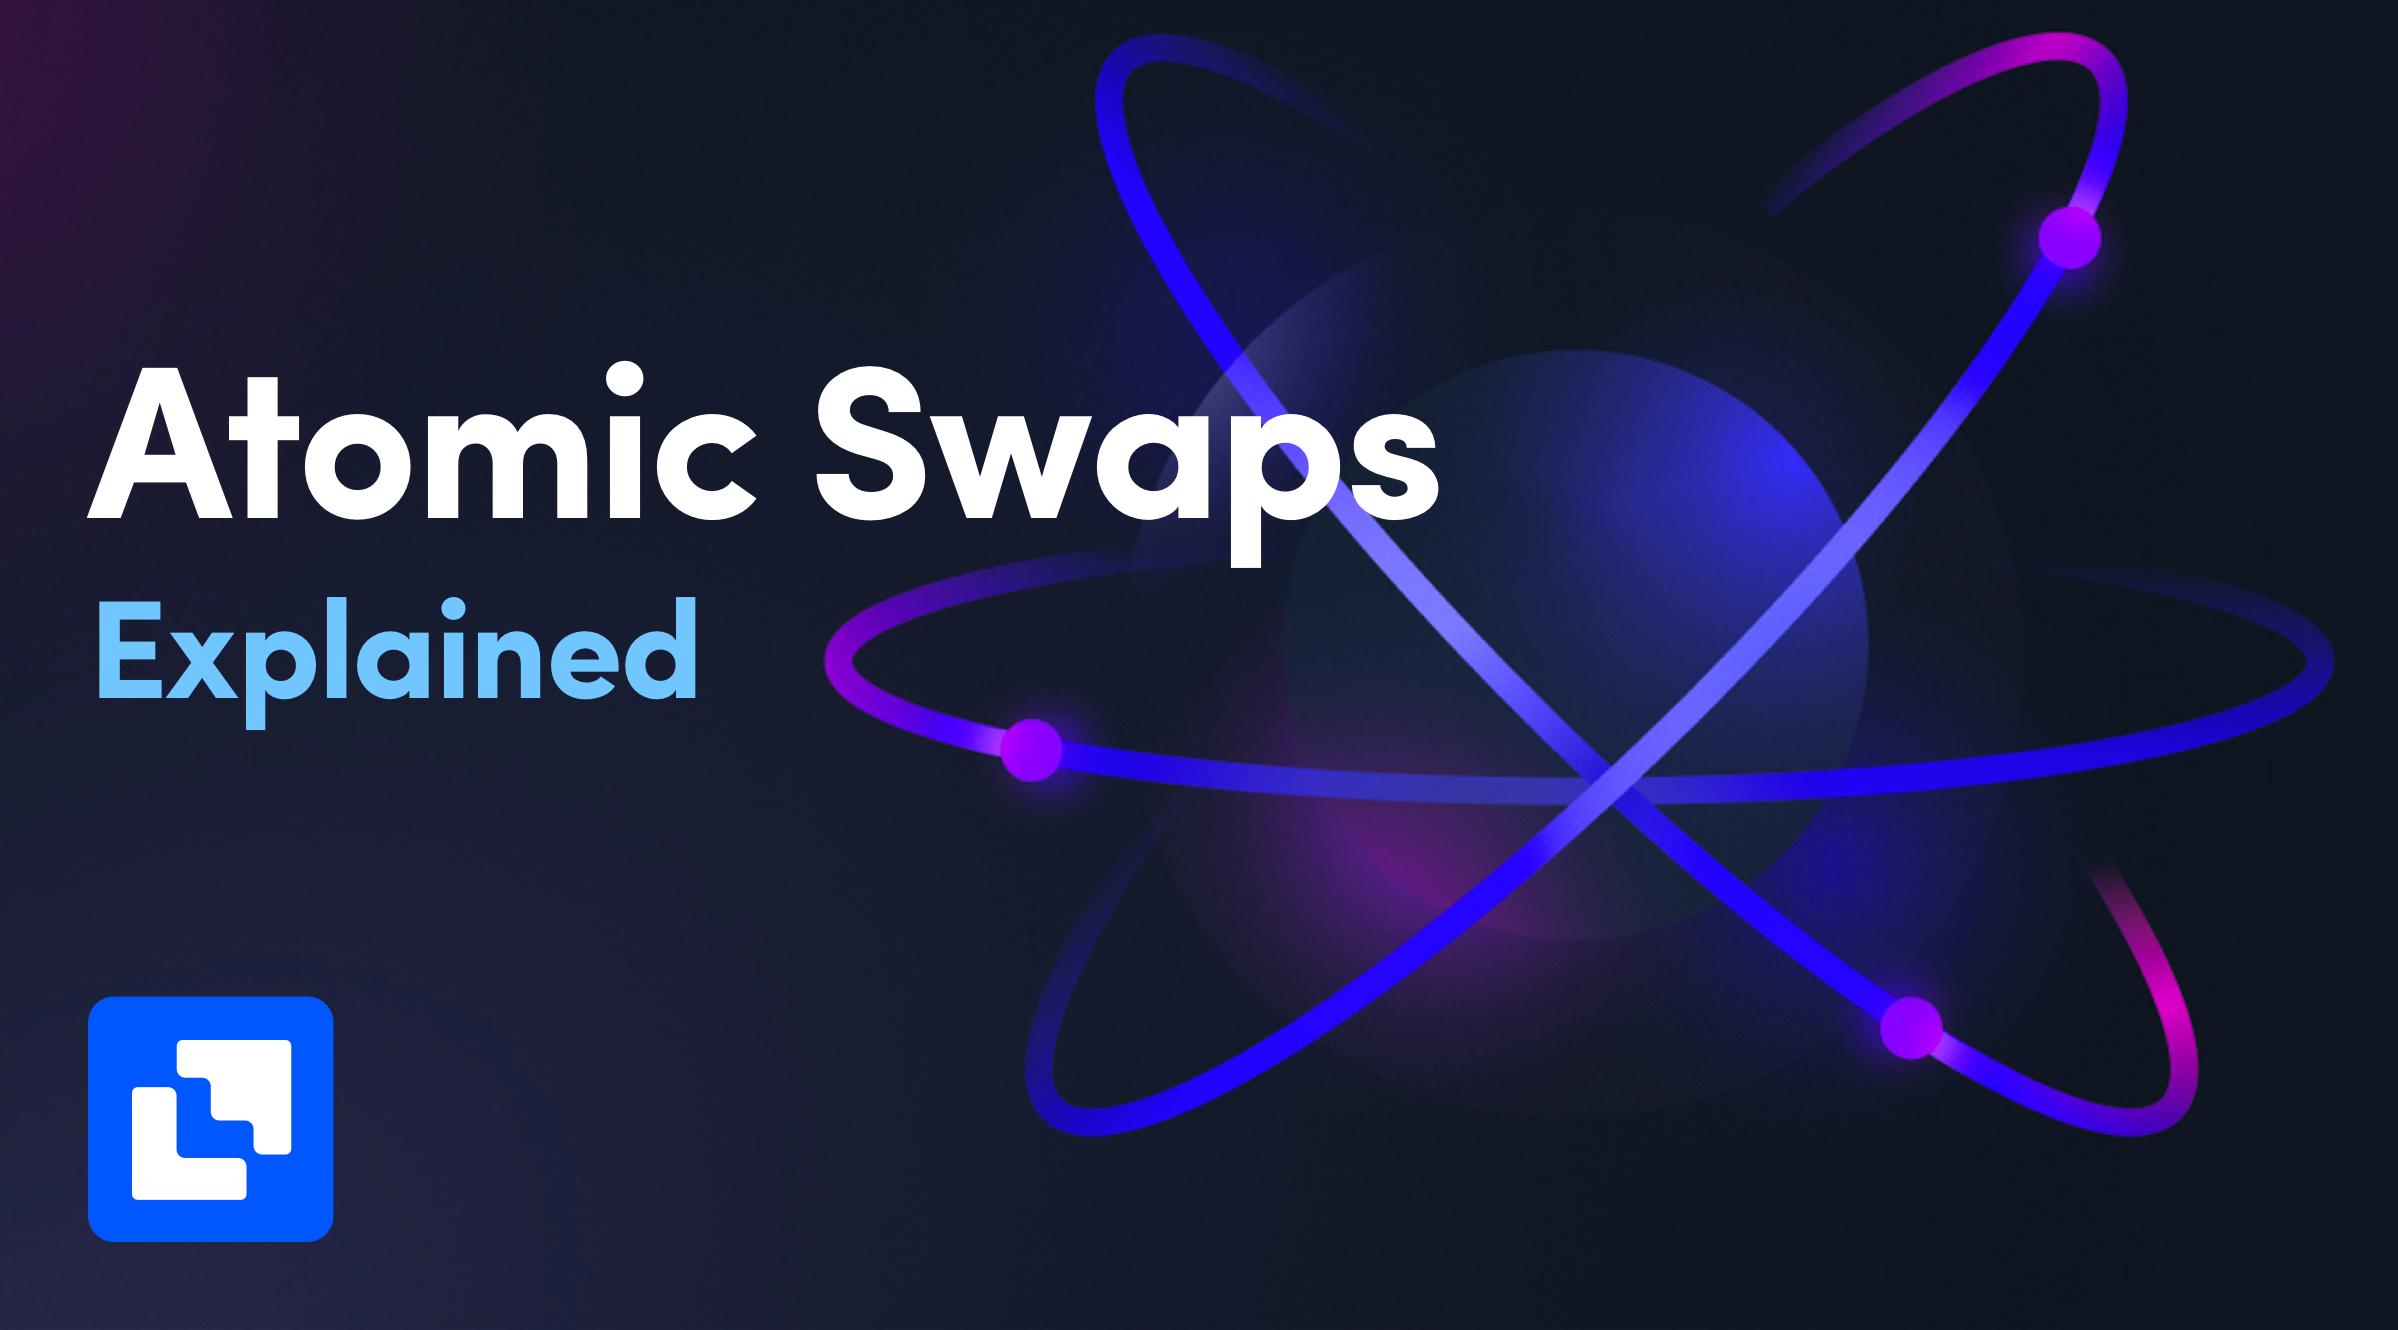 Atomic Swaps explained on Liquid